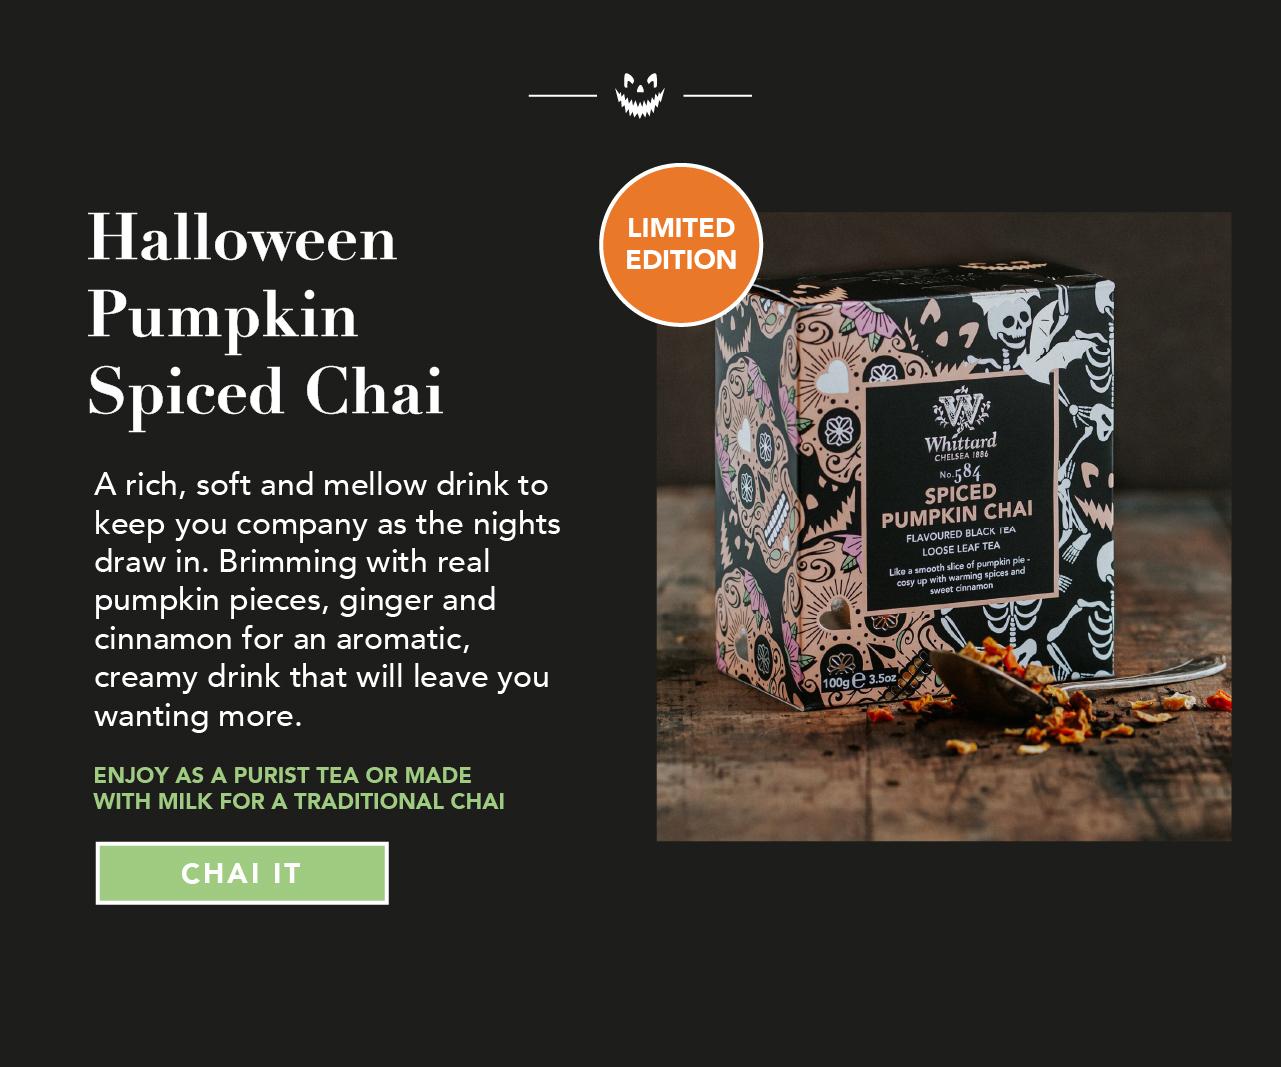 Halloween Pumpkin Spiced Chai